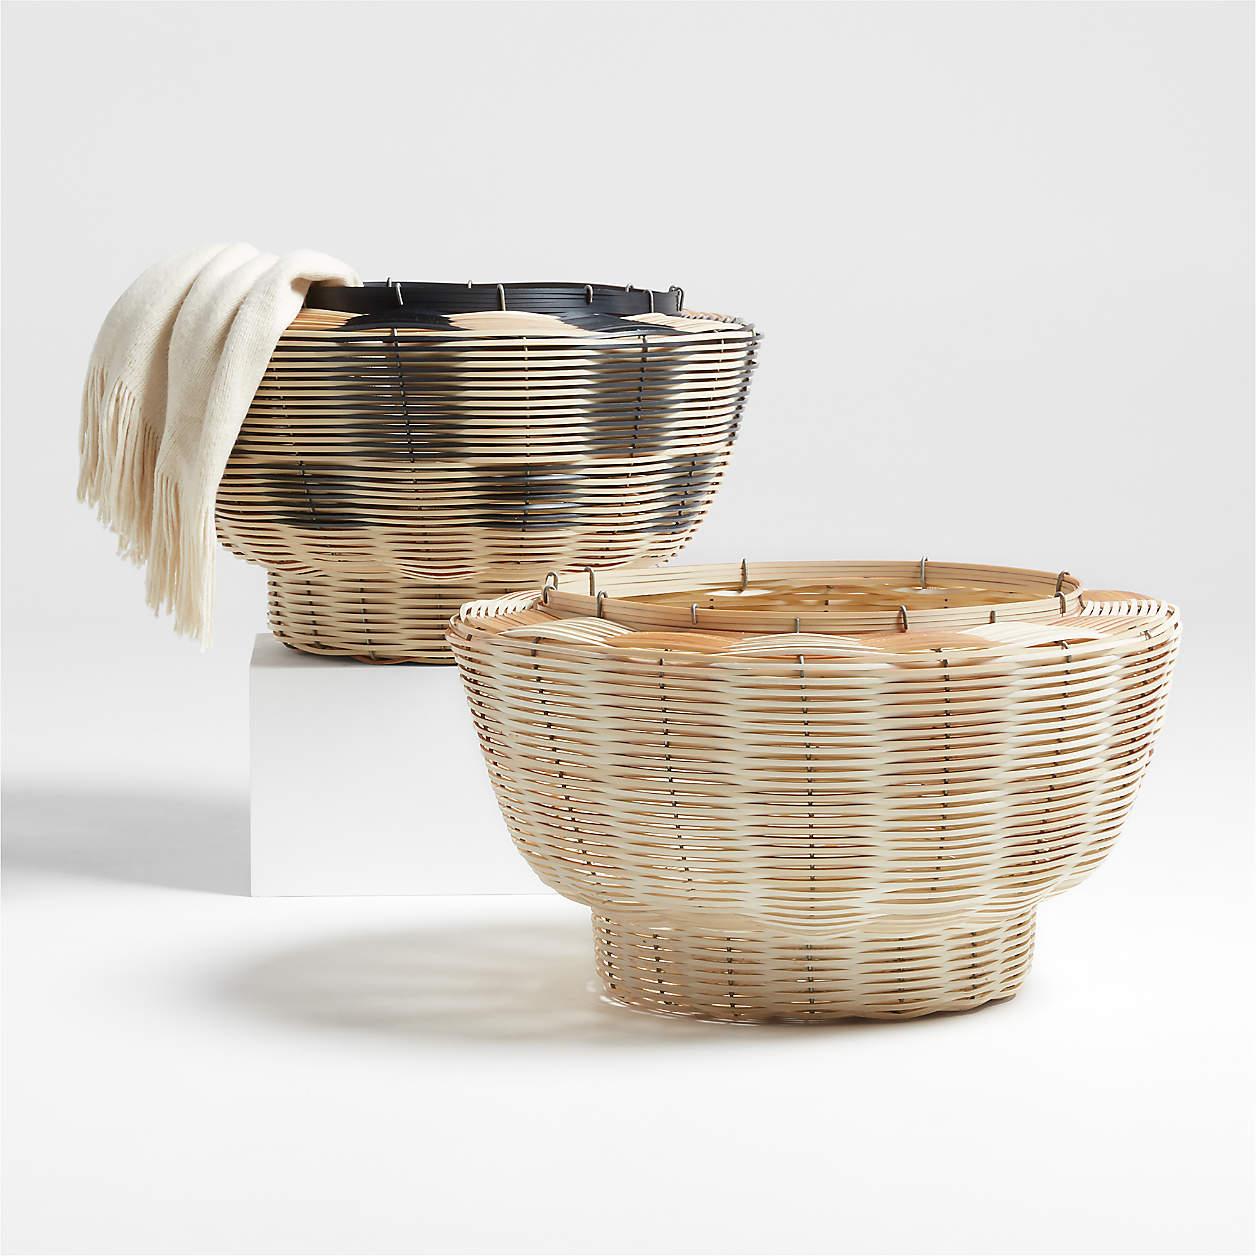 mos-crib-woven-baskets